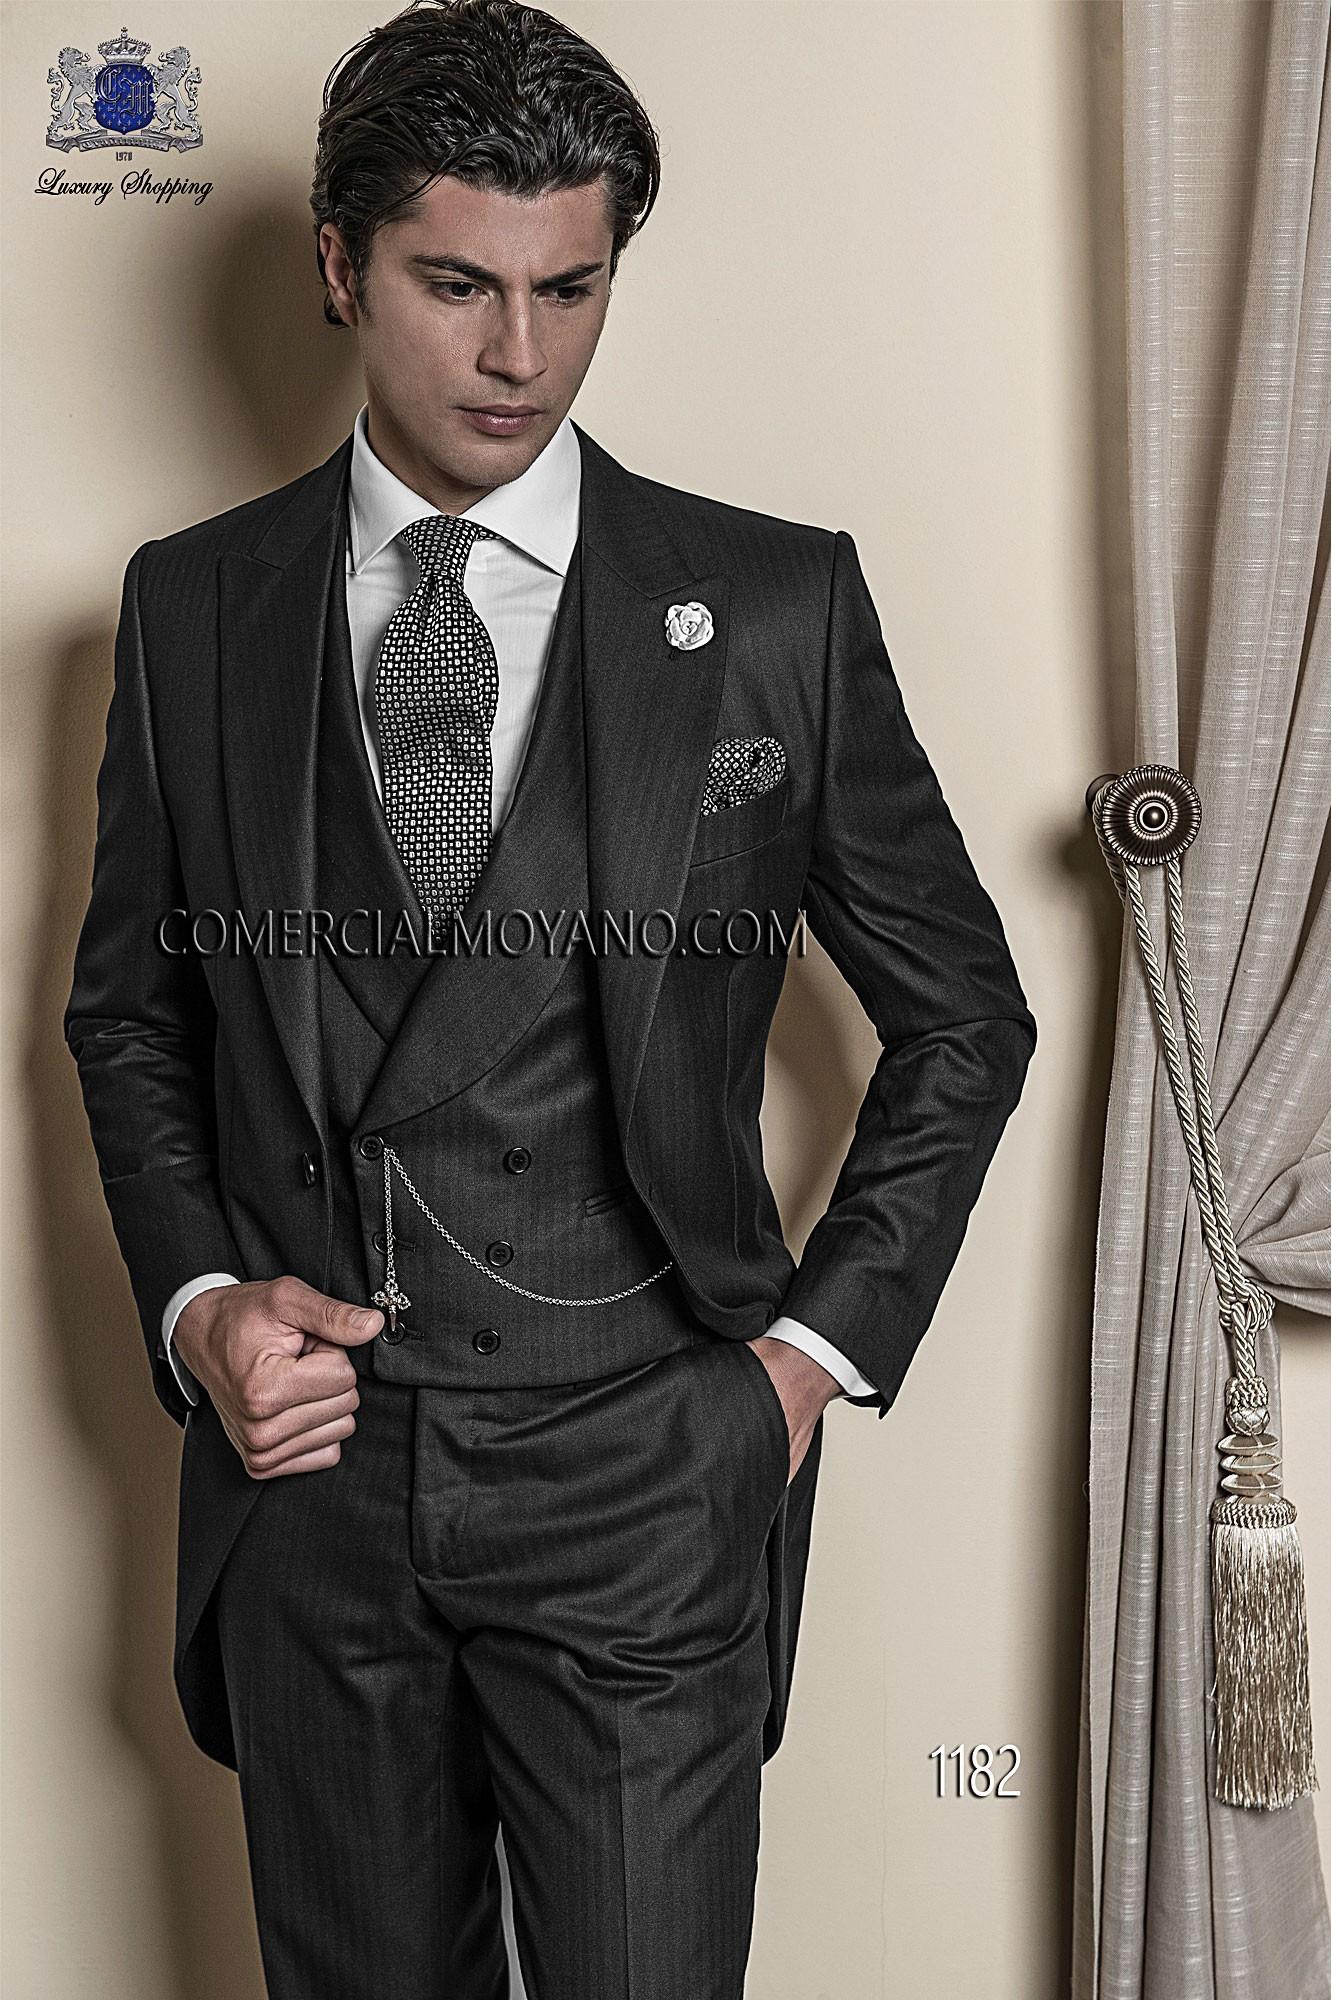 Gentleman black men wedding suit model 1182 Ottavio Nuccio Gala